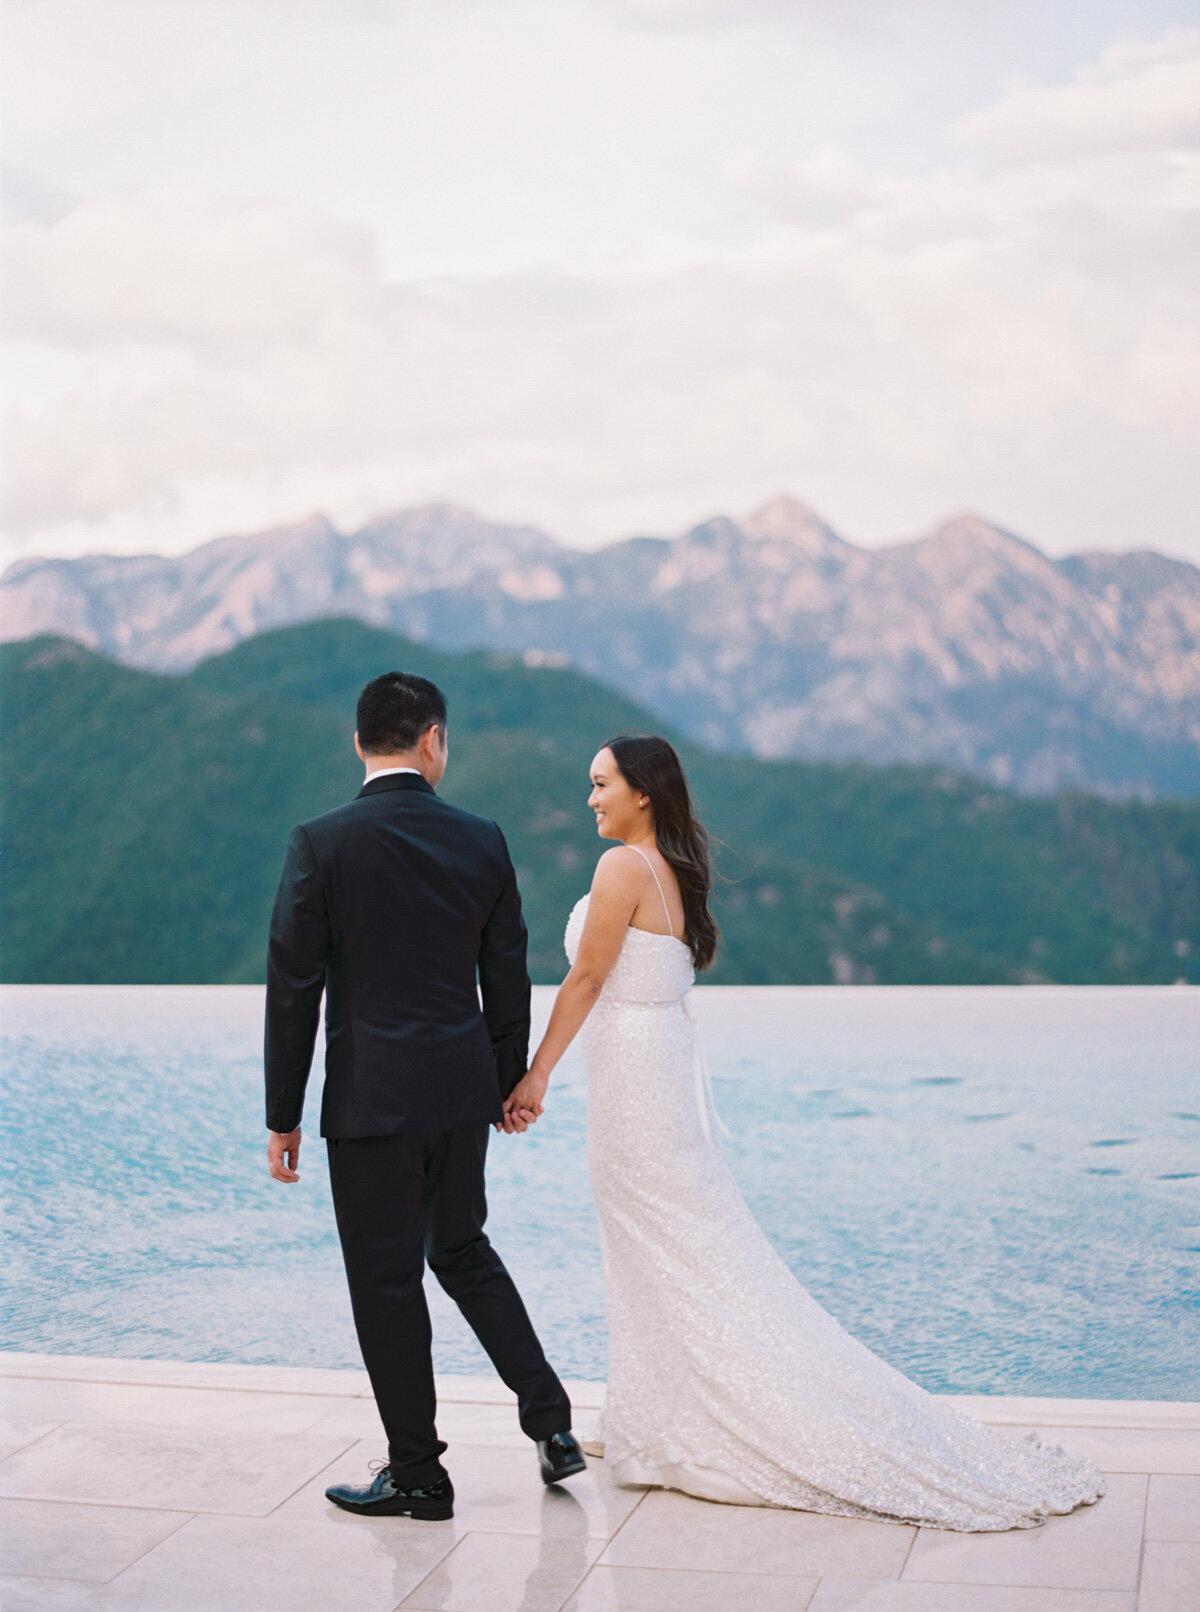 Belmond-Hotel-Caruso-ravello-elopement-Katie-Grant-destination-wedding (41 of 50).jpg